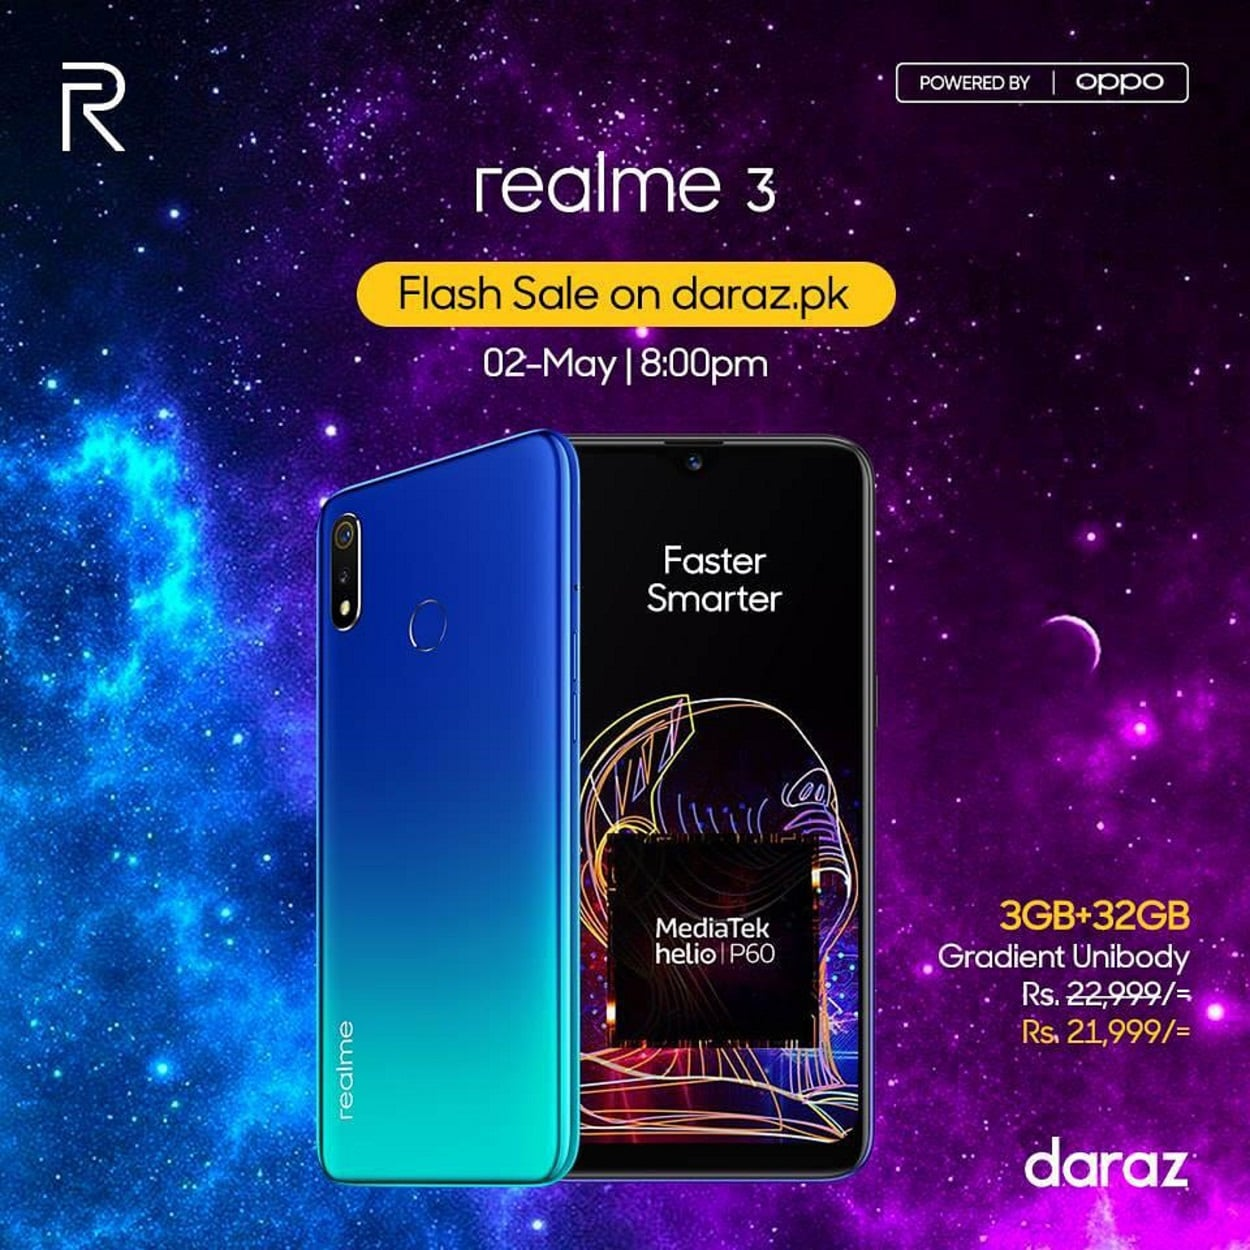 Realme 3 earned a high rating of 5 on Daraz.com